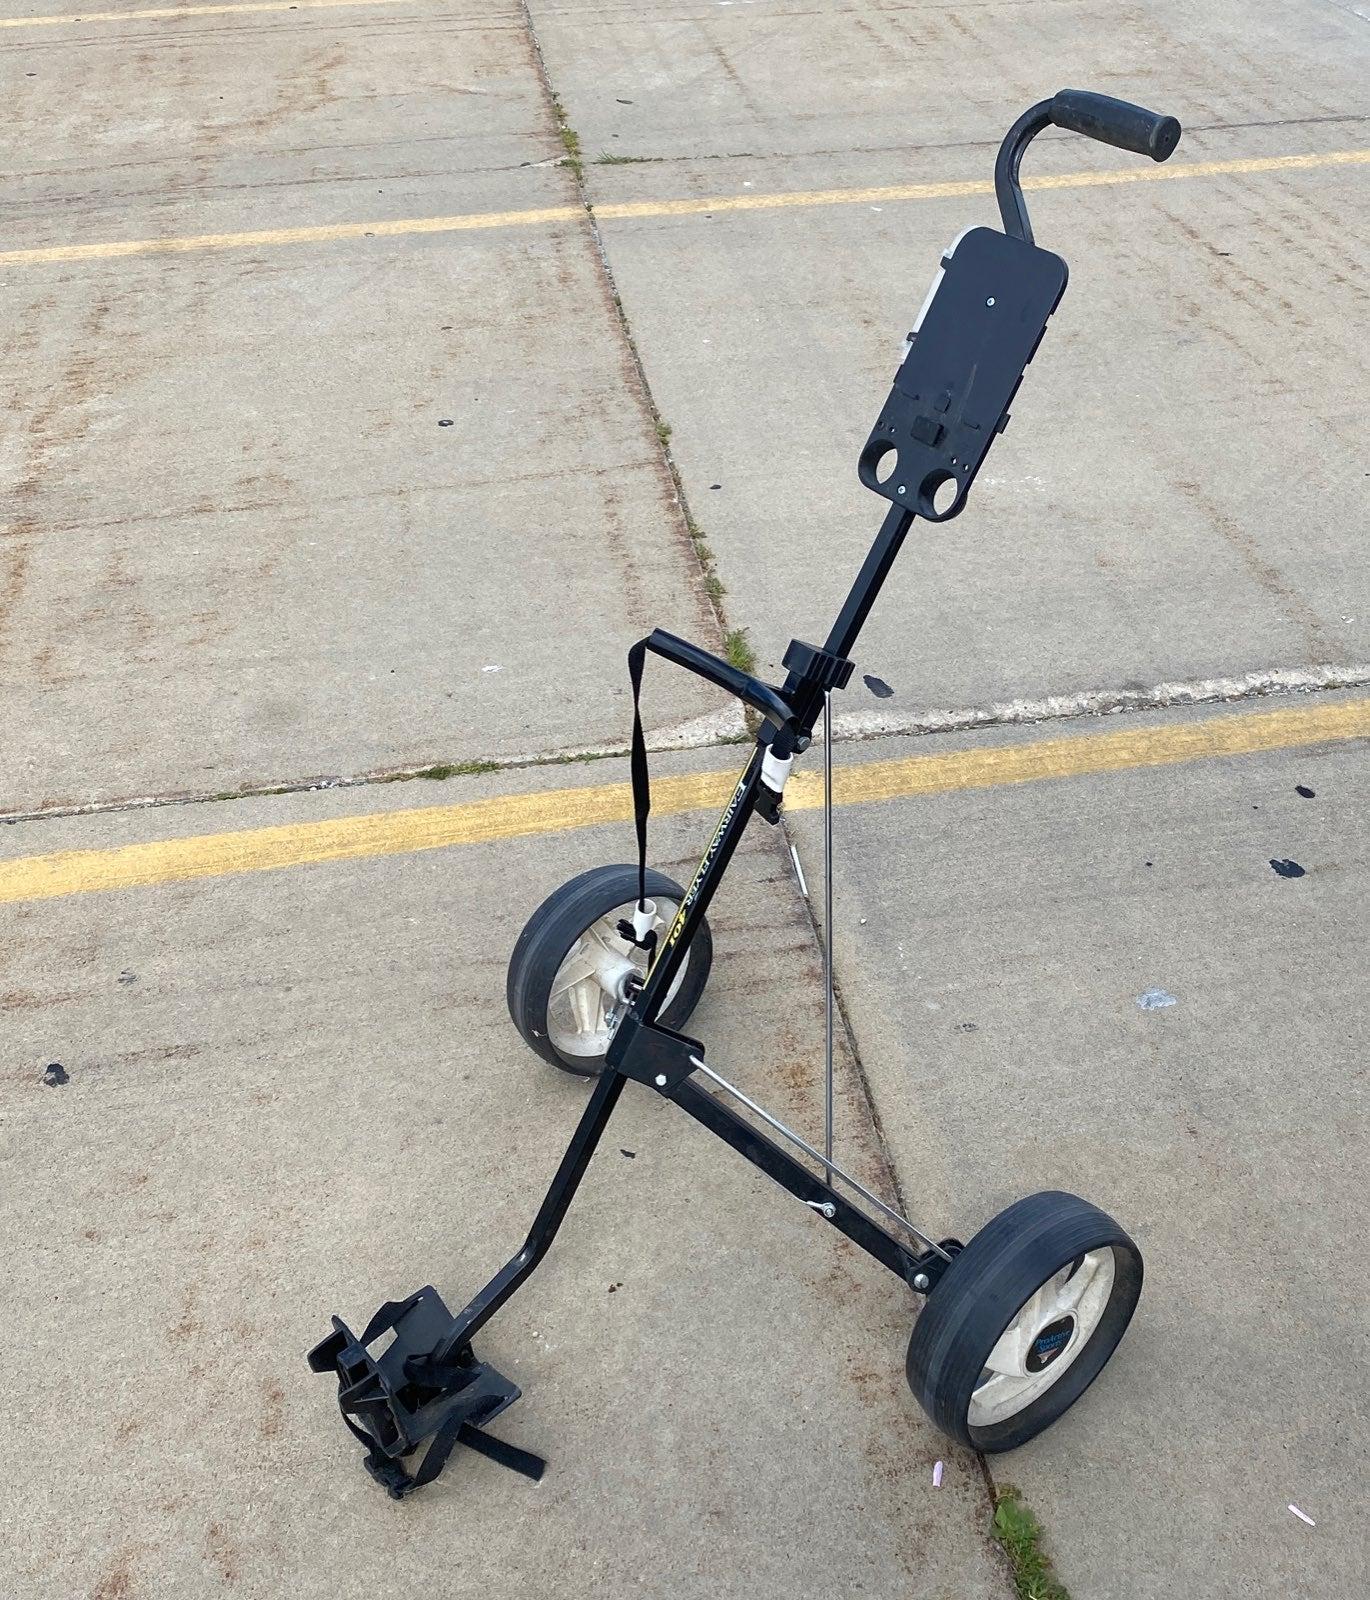 Fairway flyer 40I pul golf bag  cart Use